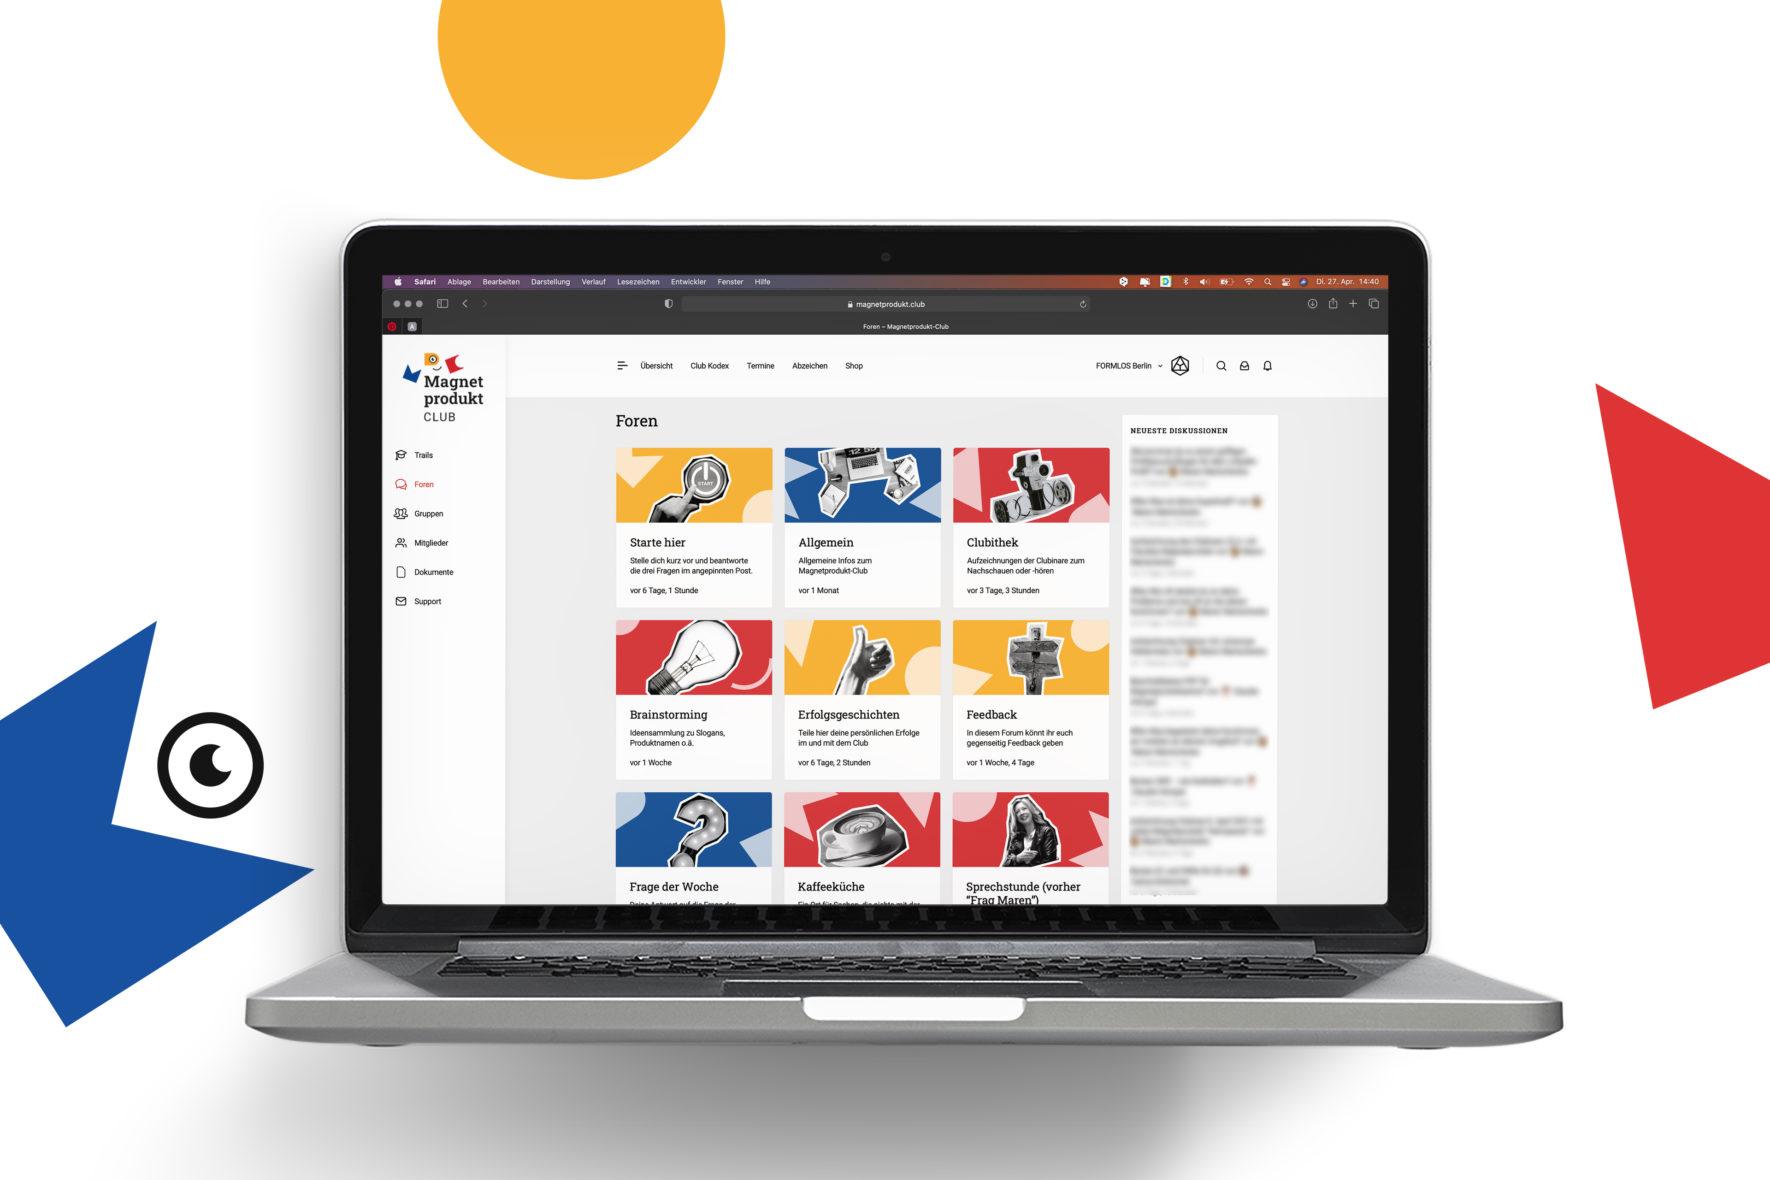 Magnetprodukt-Club-Branding-Logo-Entwicklung-FORMLOS-Berlin-Gestaltung-Design-Forenbilder-Bildsprache